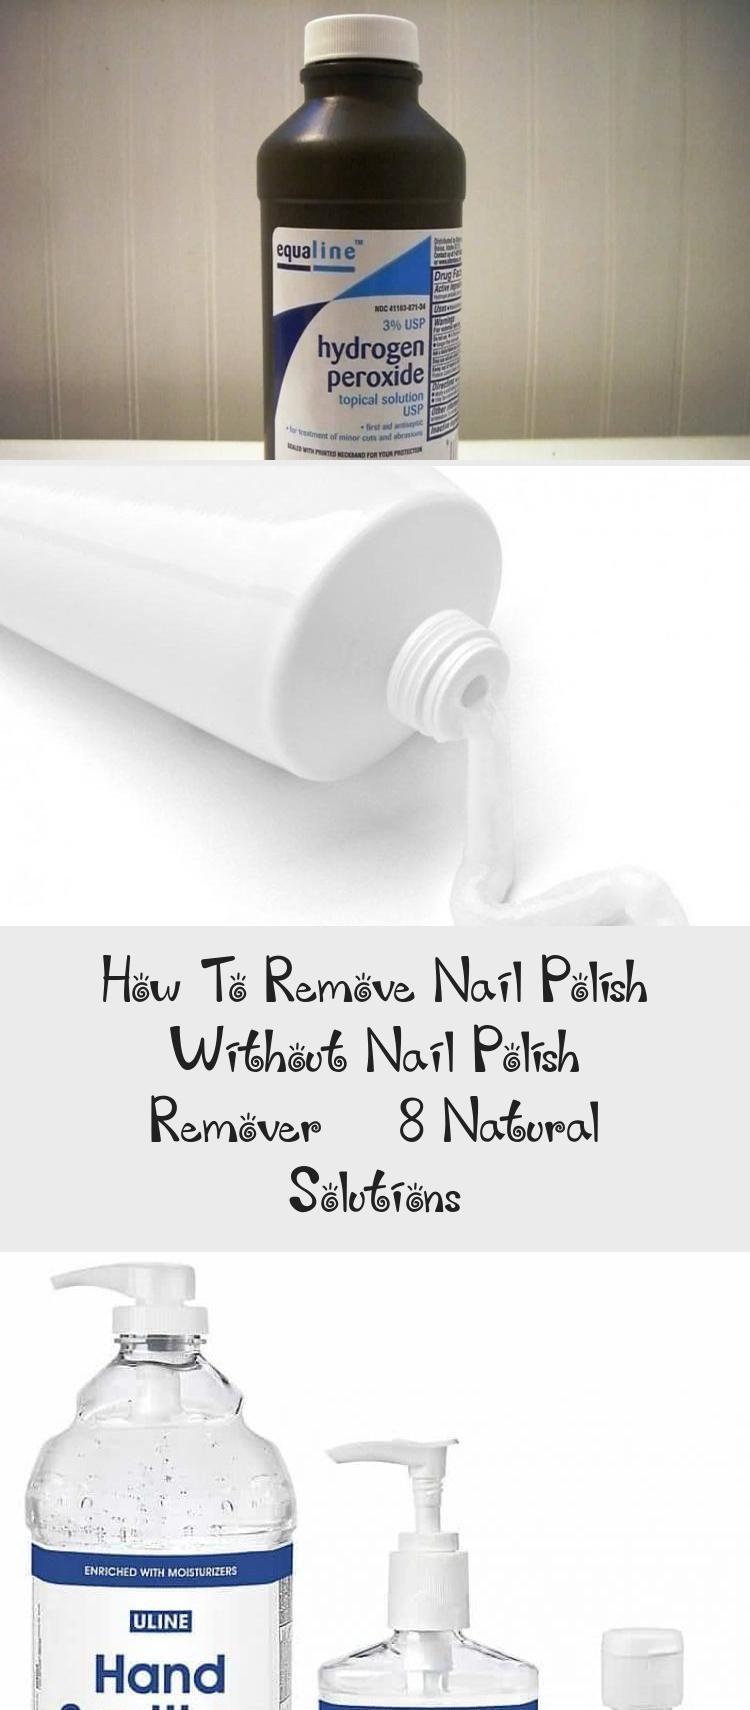 How To Remove Nail Polish Without Nail Polish Remover 8 Natural